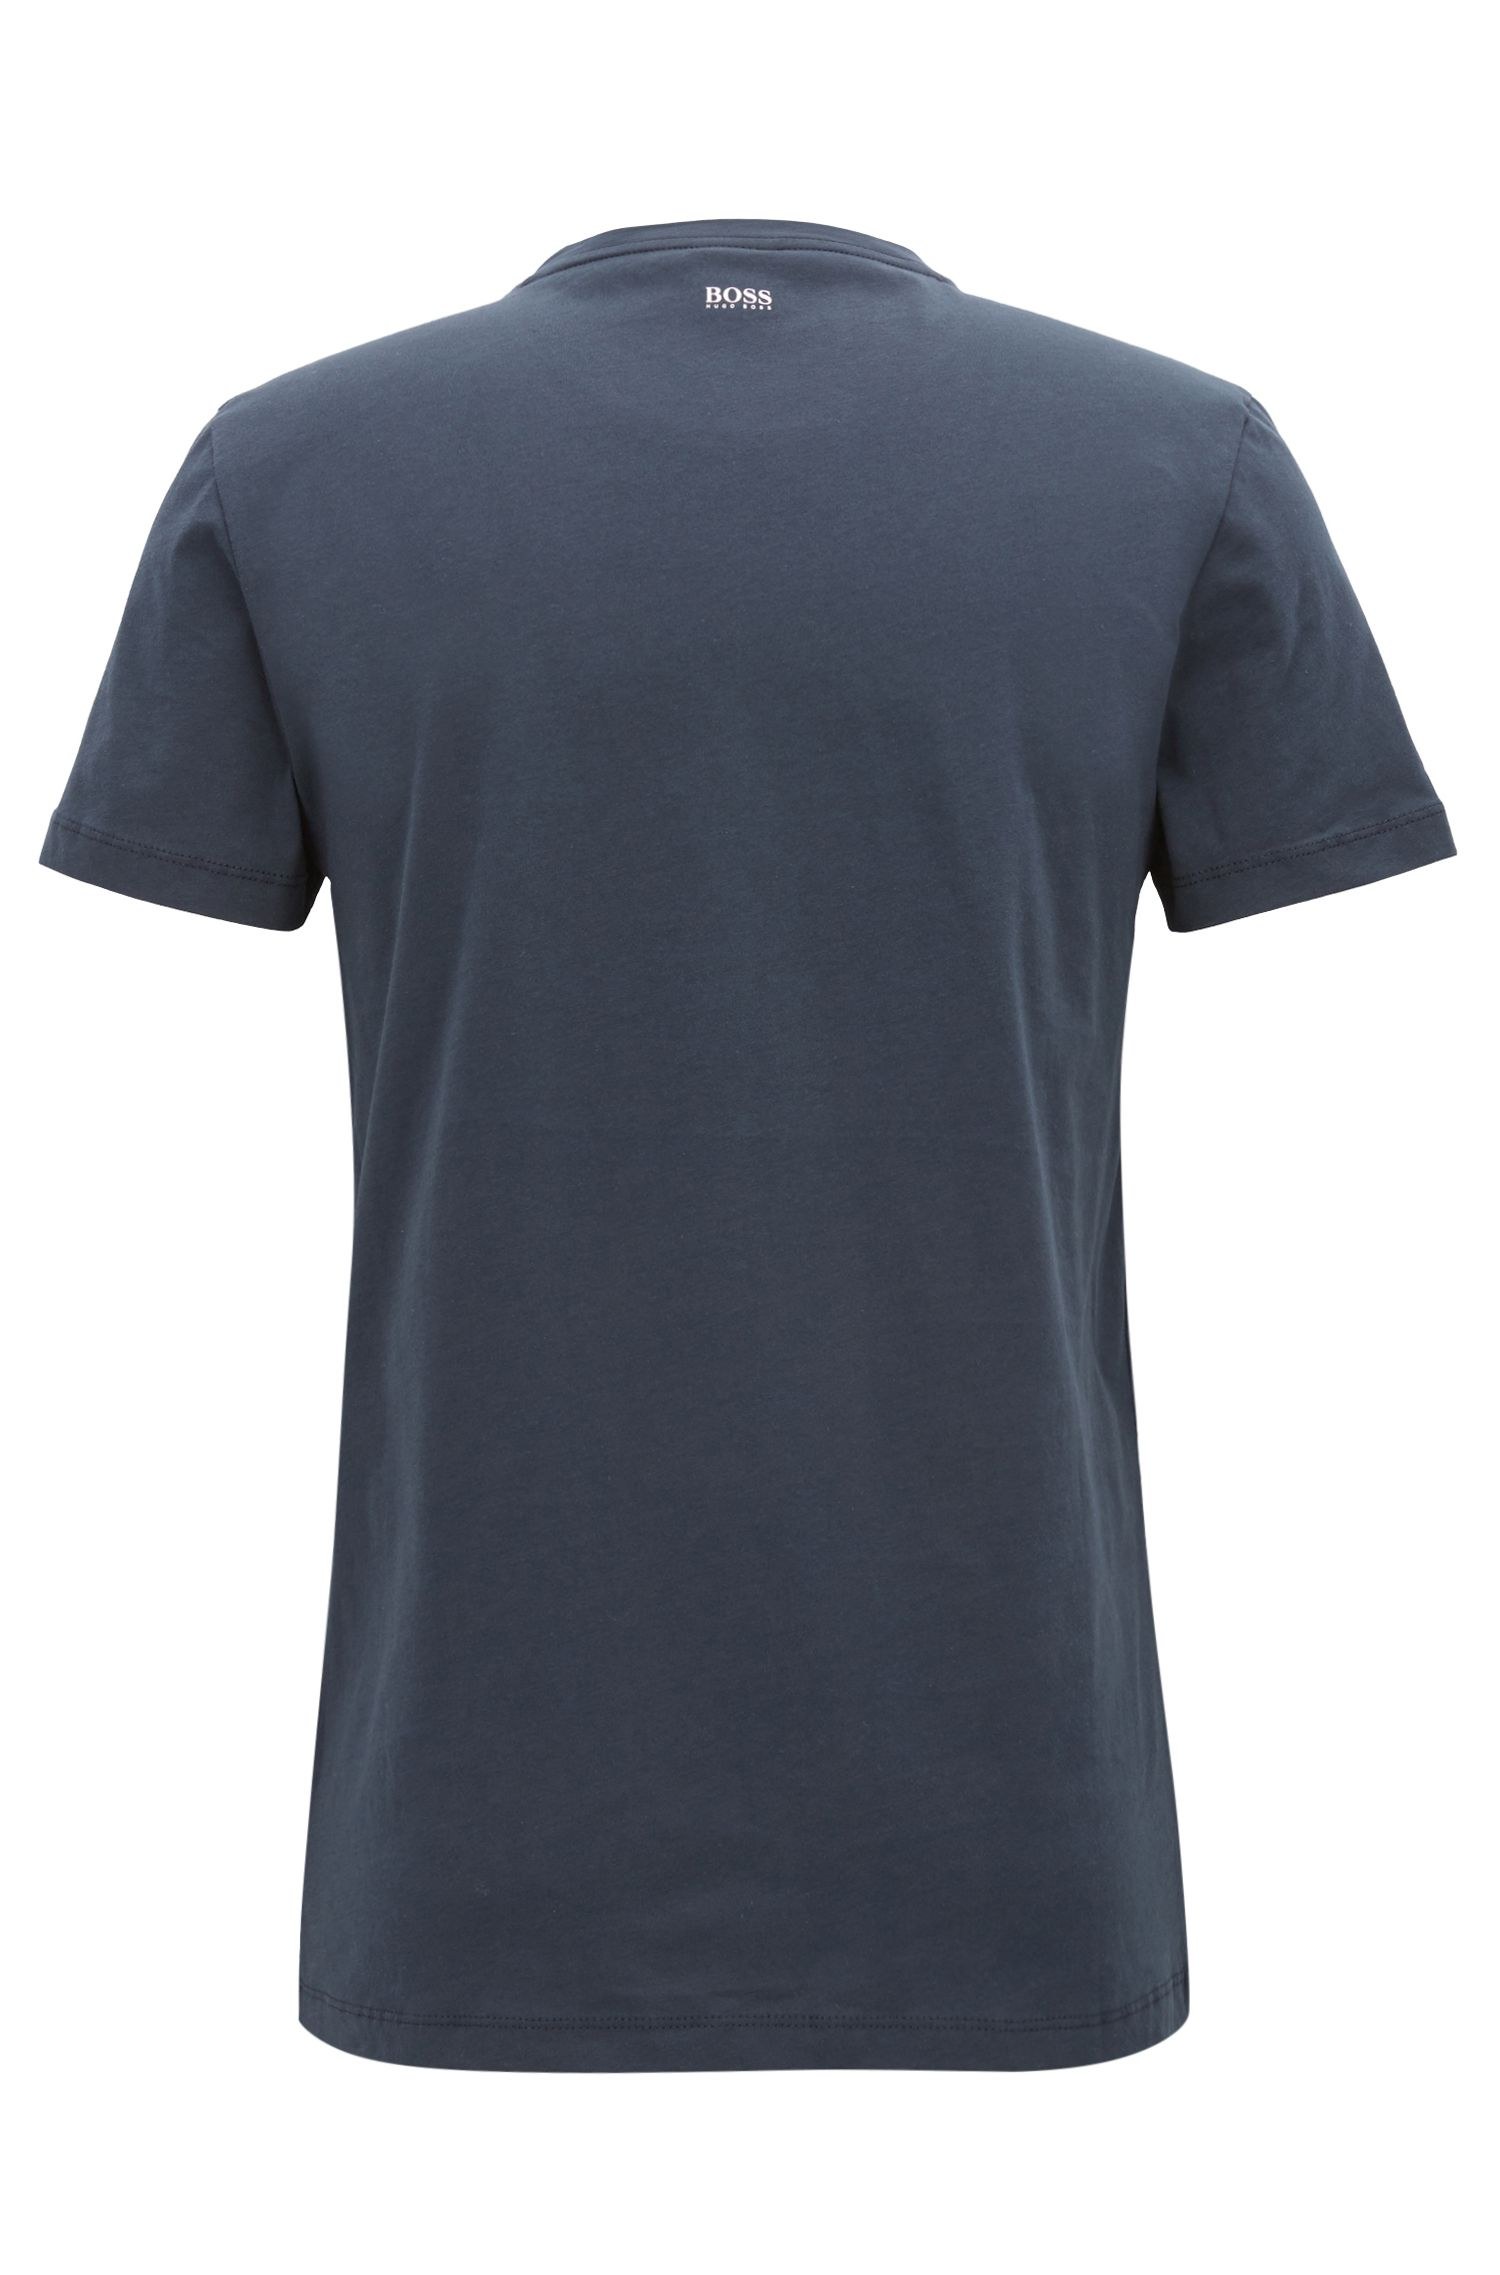 Jersey T-shirt with dégradé flocked logo, Dark Blue